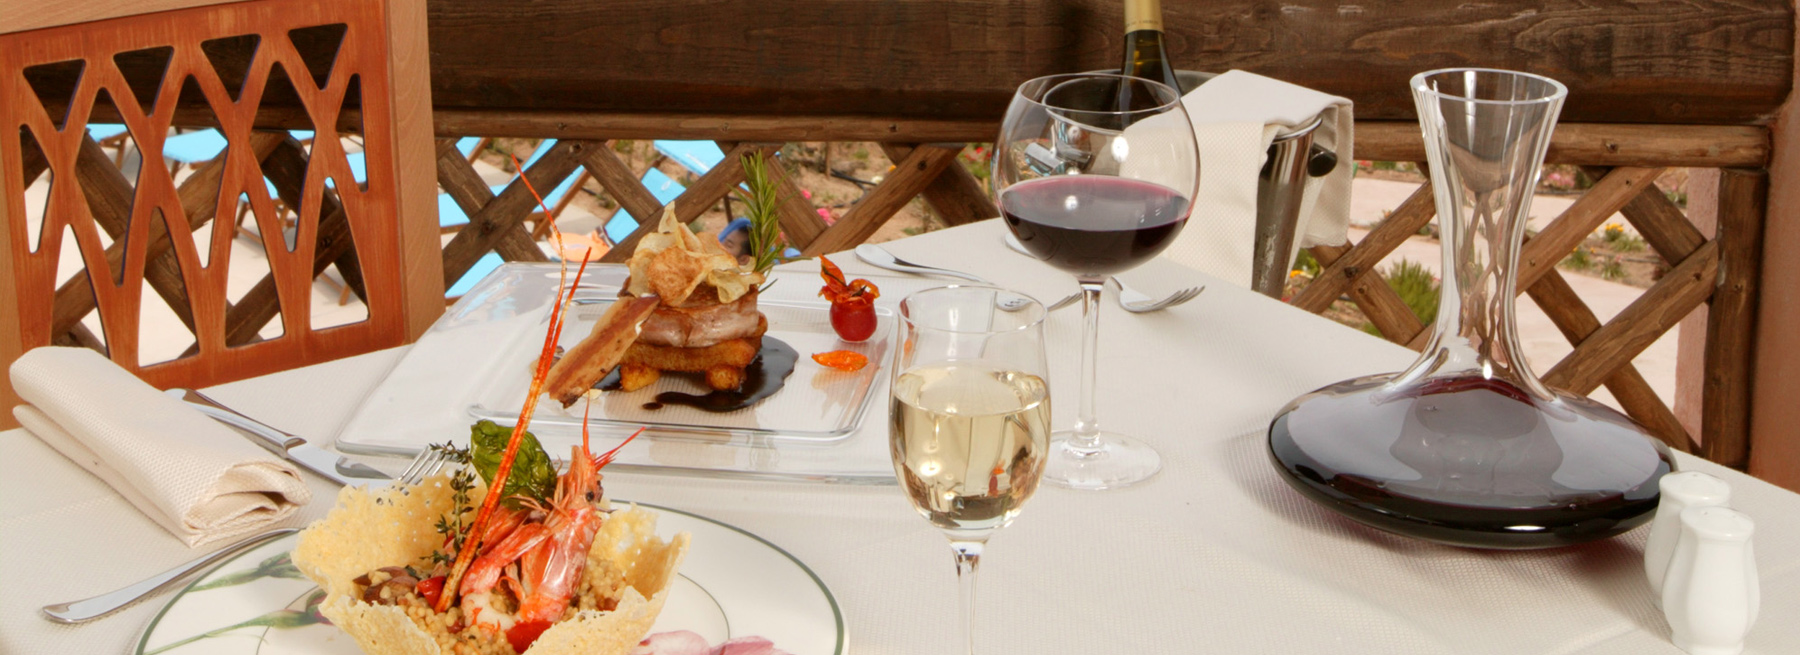 gruppo-delphina_slider_sapori-tour-gastronomico-11